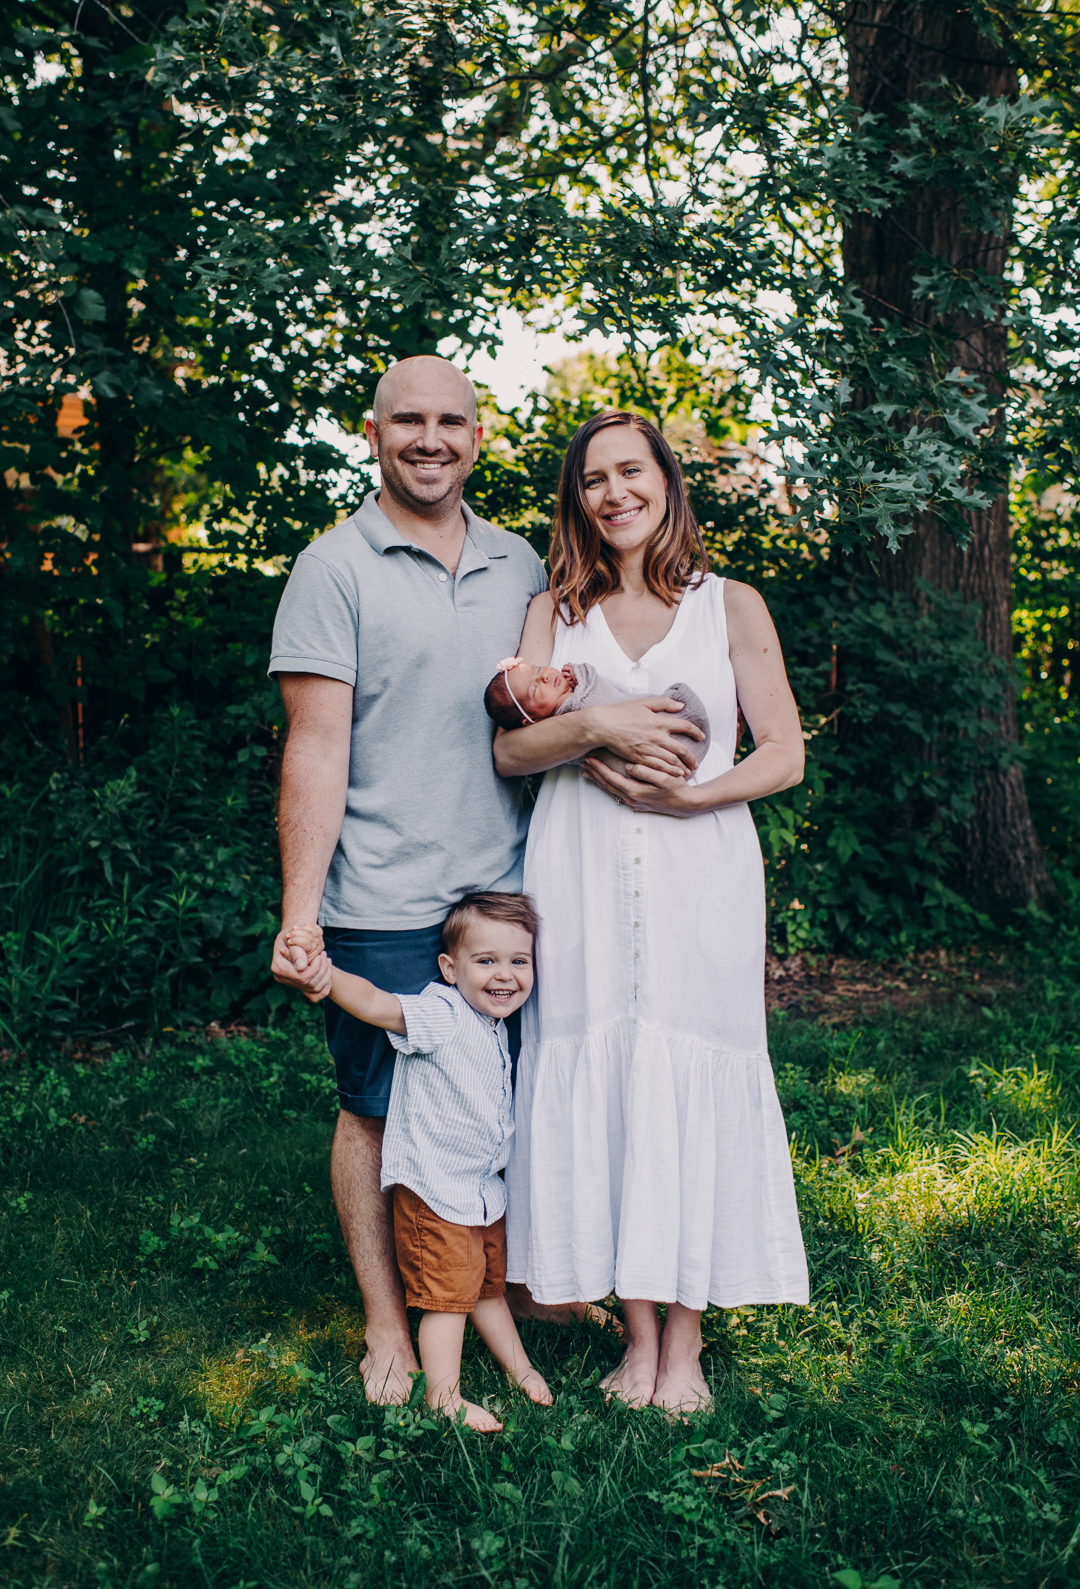 TerraSuraPhotography-Sloane Vasseur Family Newborn-Web-4946.jpg